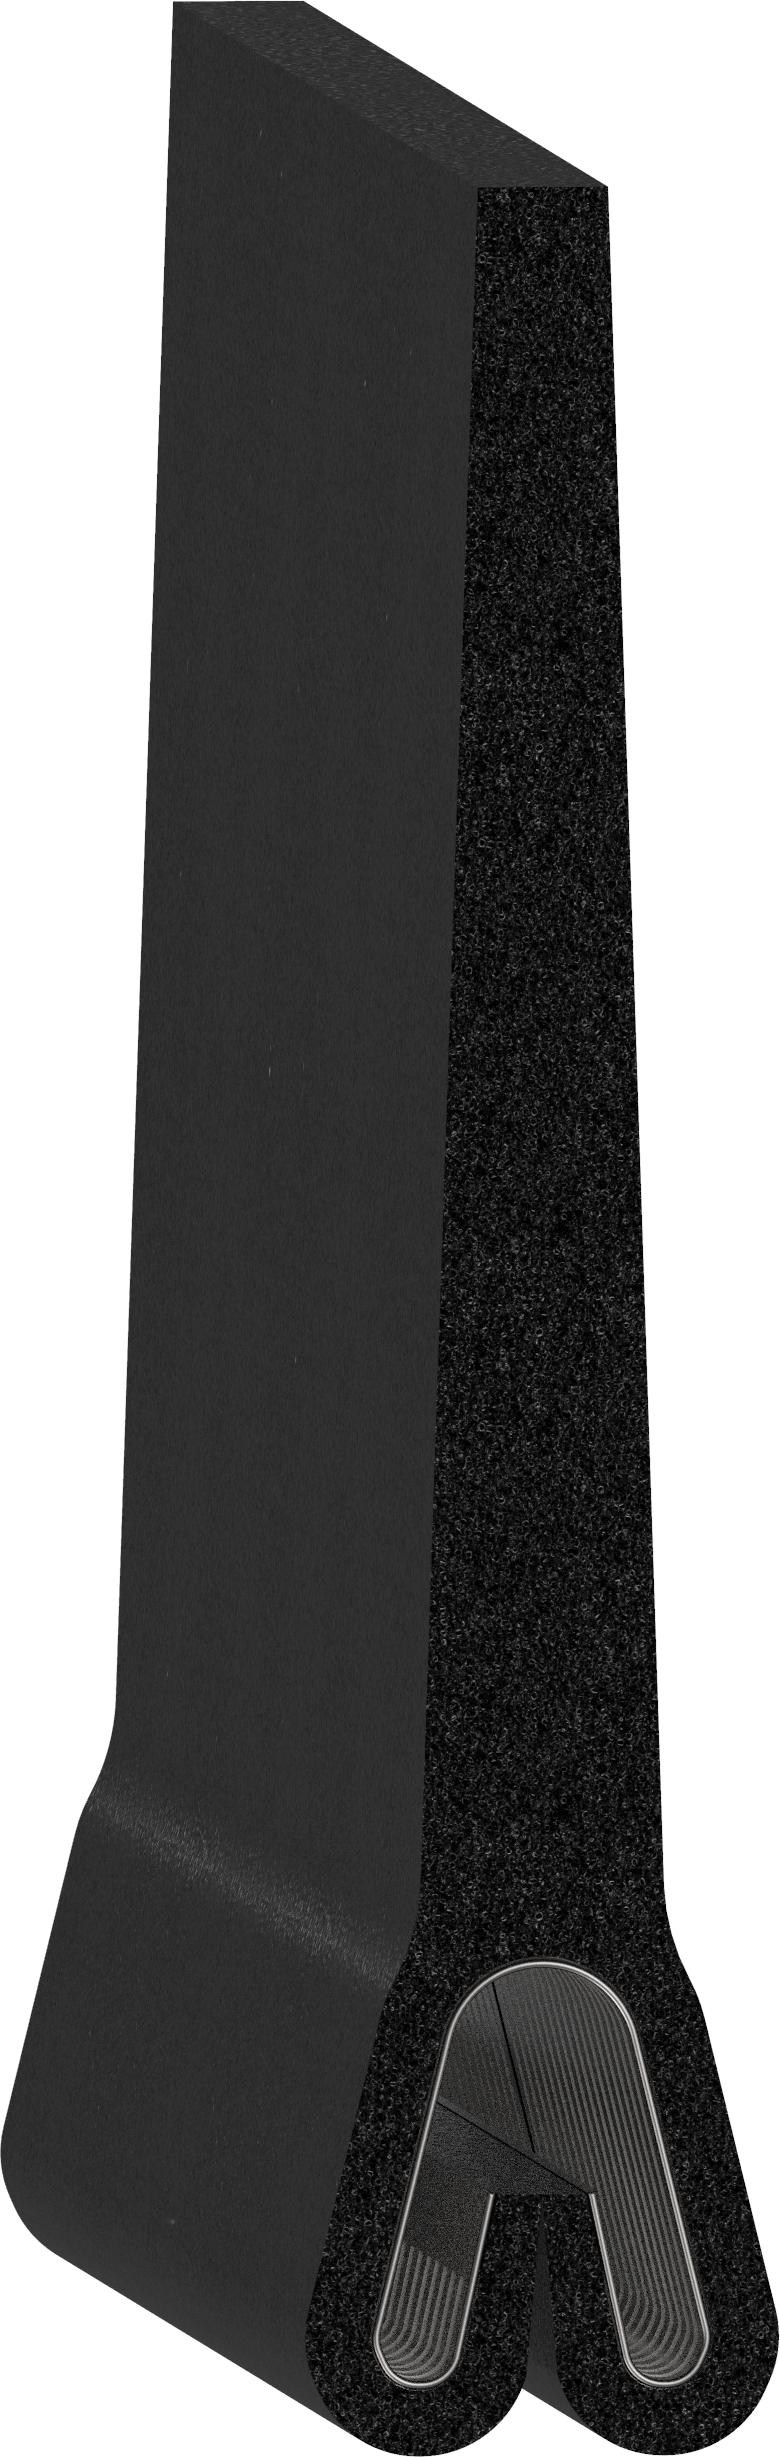 Uni-Grip part: ED-5200